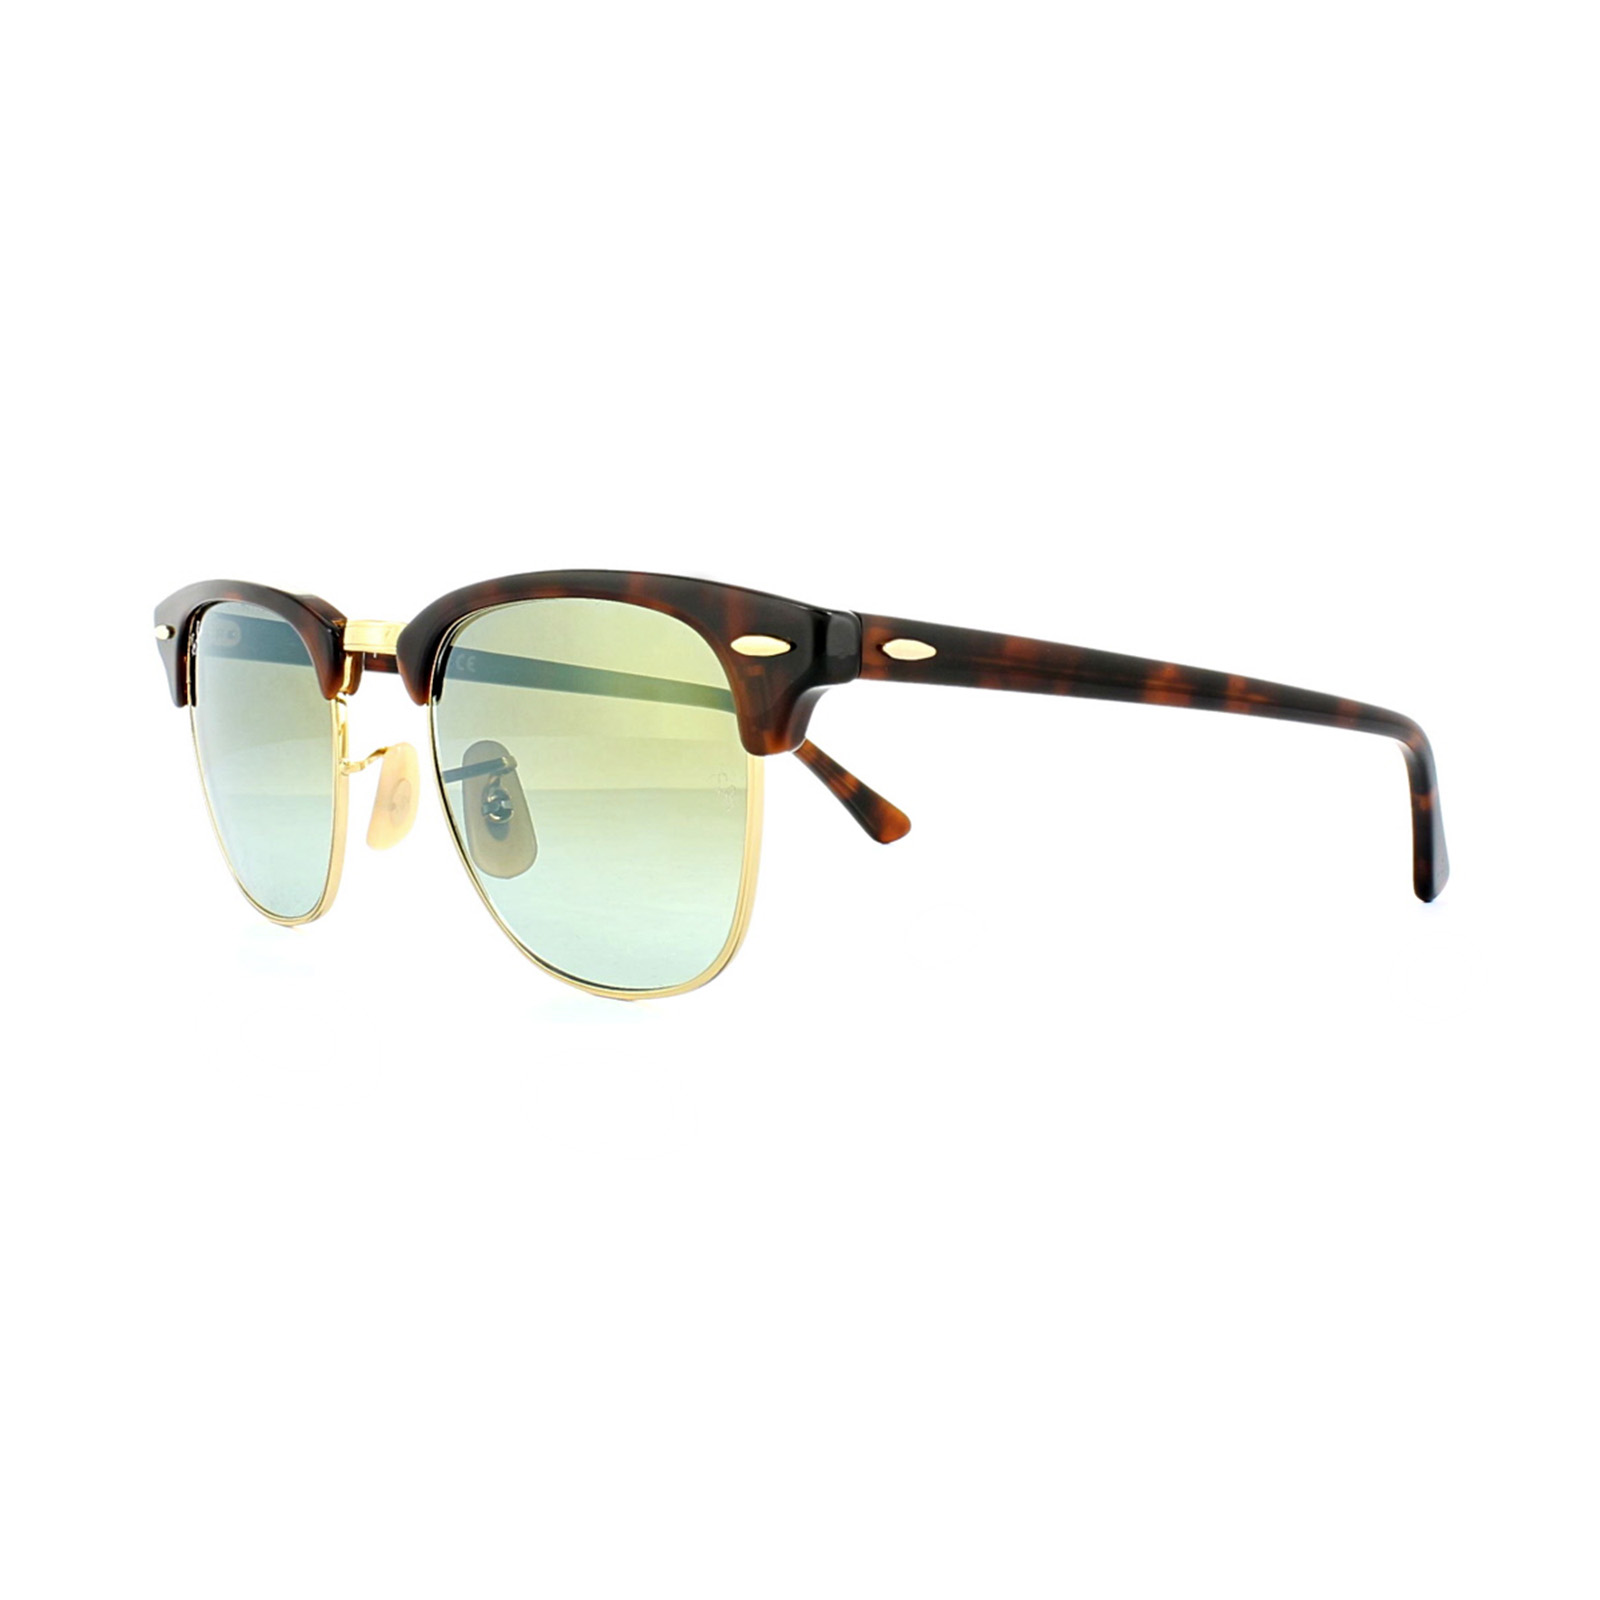 b4f5537795 Sentinel Thumbnail 1. Sentinel Ray-Ban Sunglasses Clubmaster 3016 990 9J  Tortoise Green ...